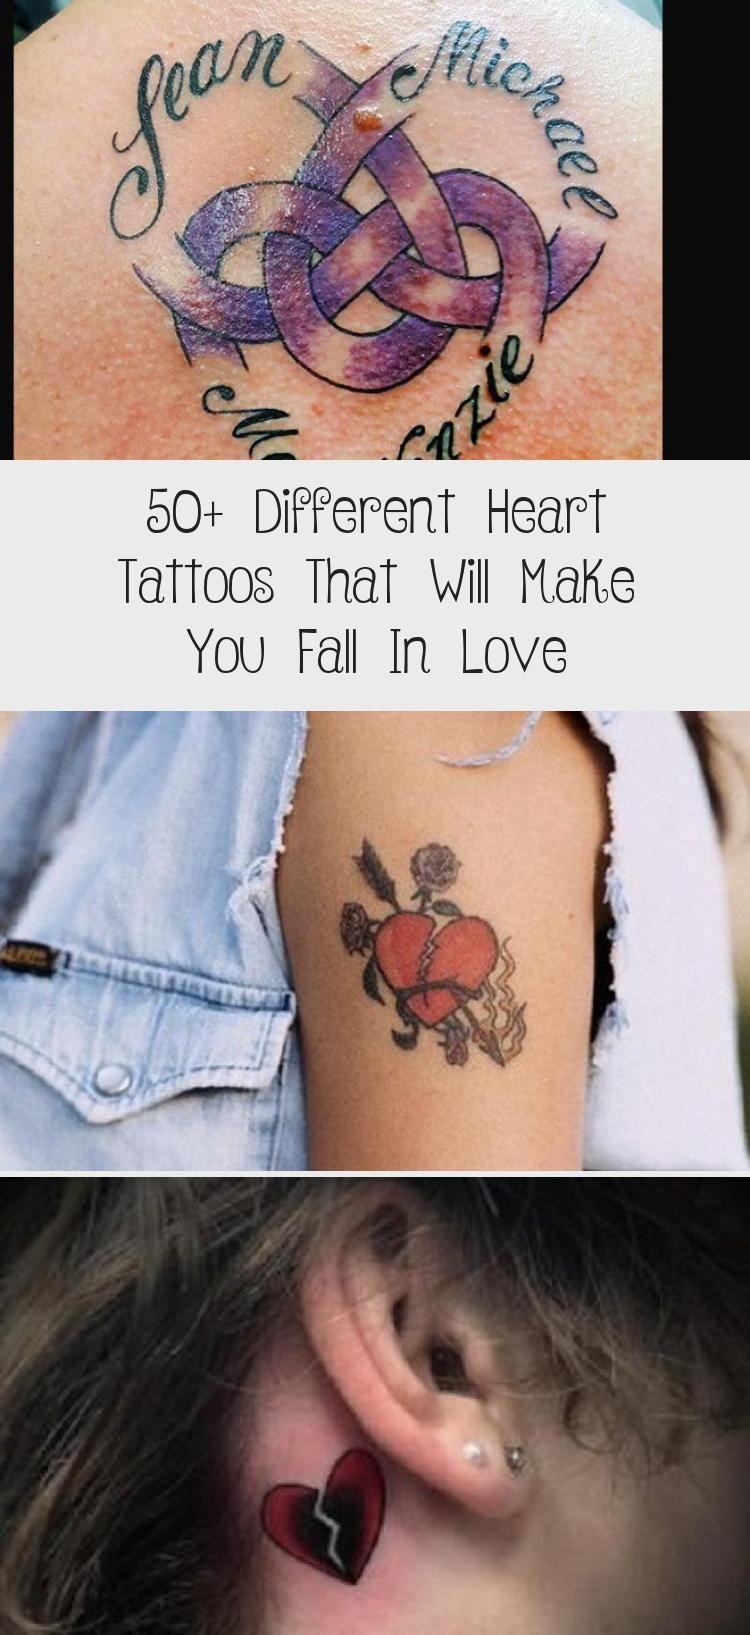 Celtic Heart Tattoo Rosehearttattoo Hearttattoovintage Bighearttattoo Tinyhearttattoo Twohearttattoo In 2020 Heart Tattoo Broken Heart Tattoo Black Heart Tattoos